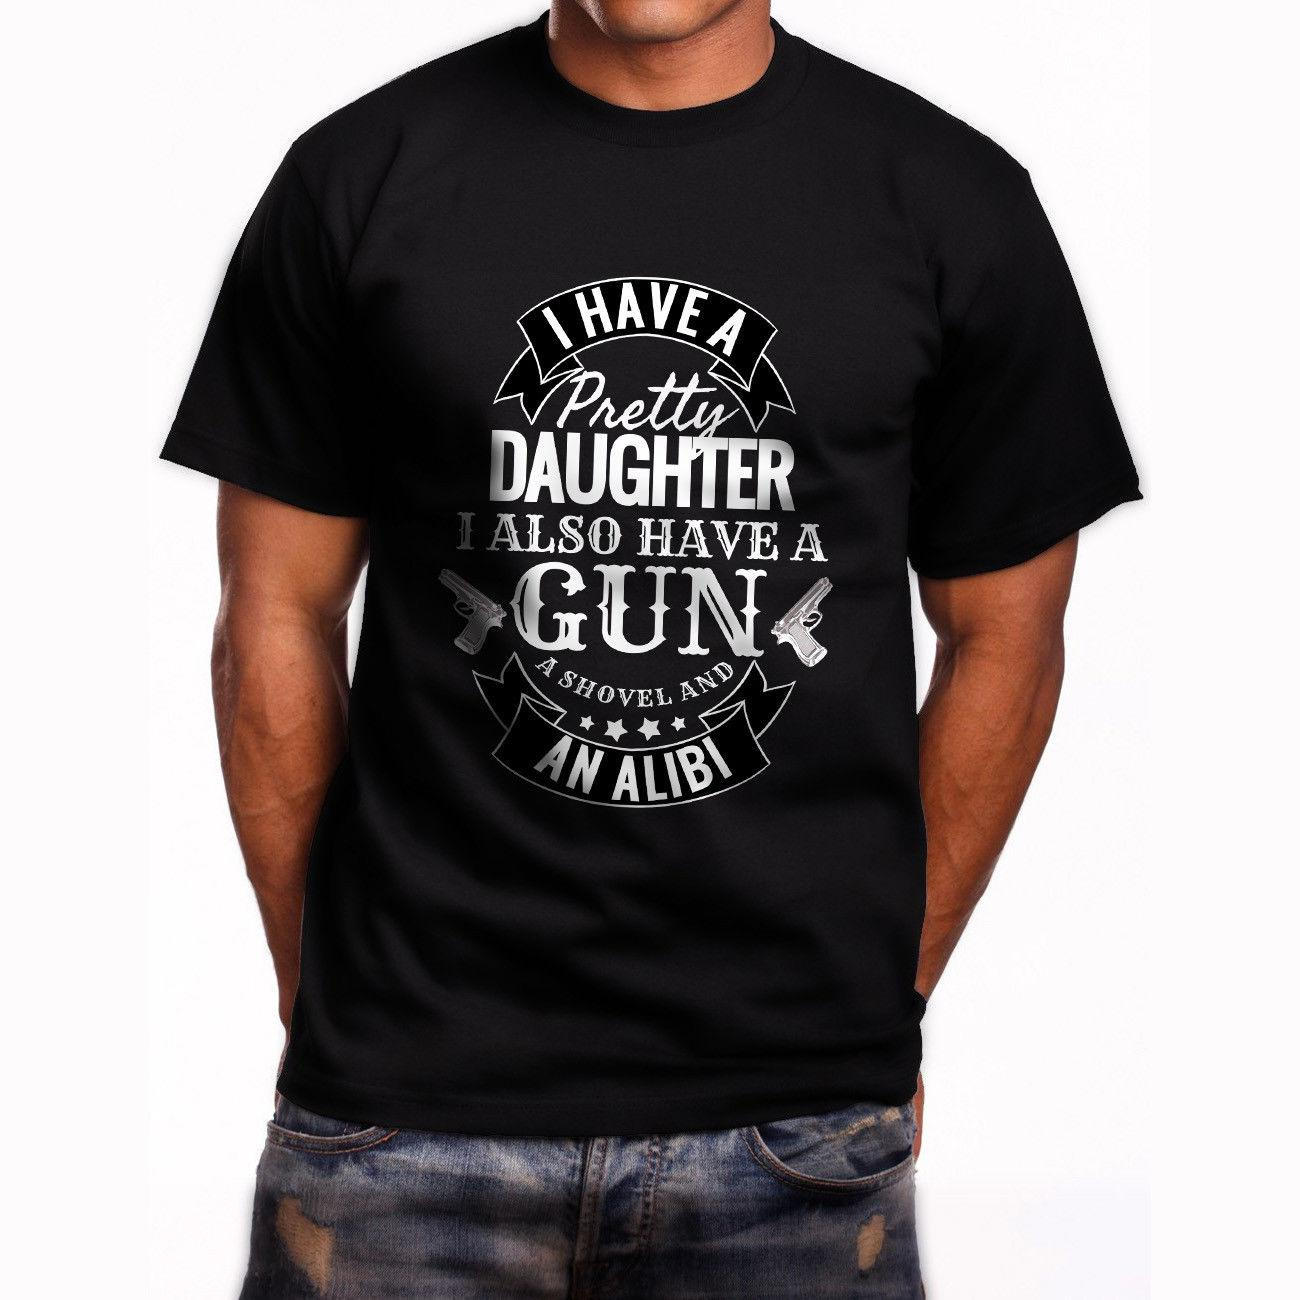 8b7500b220b I Have A Pretty Daughter I Also Have A Gun A Shovel An Alibi Men S Black T  Shirt Tee Shirt Shop Online One T Shirt A Day From Goodday065